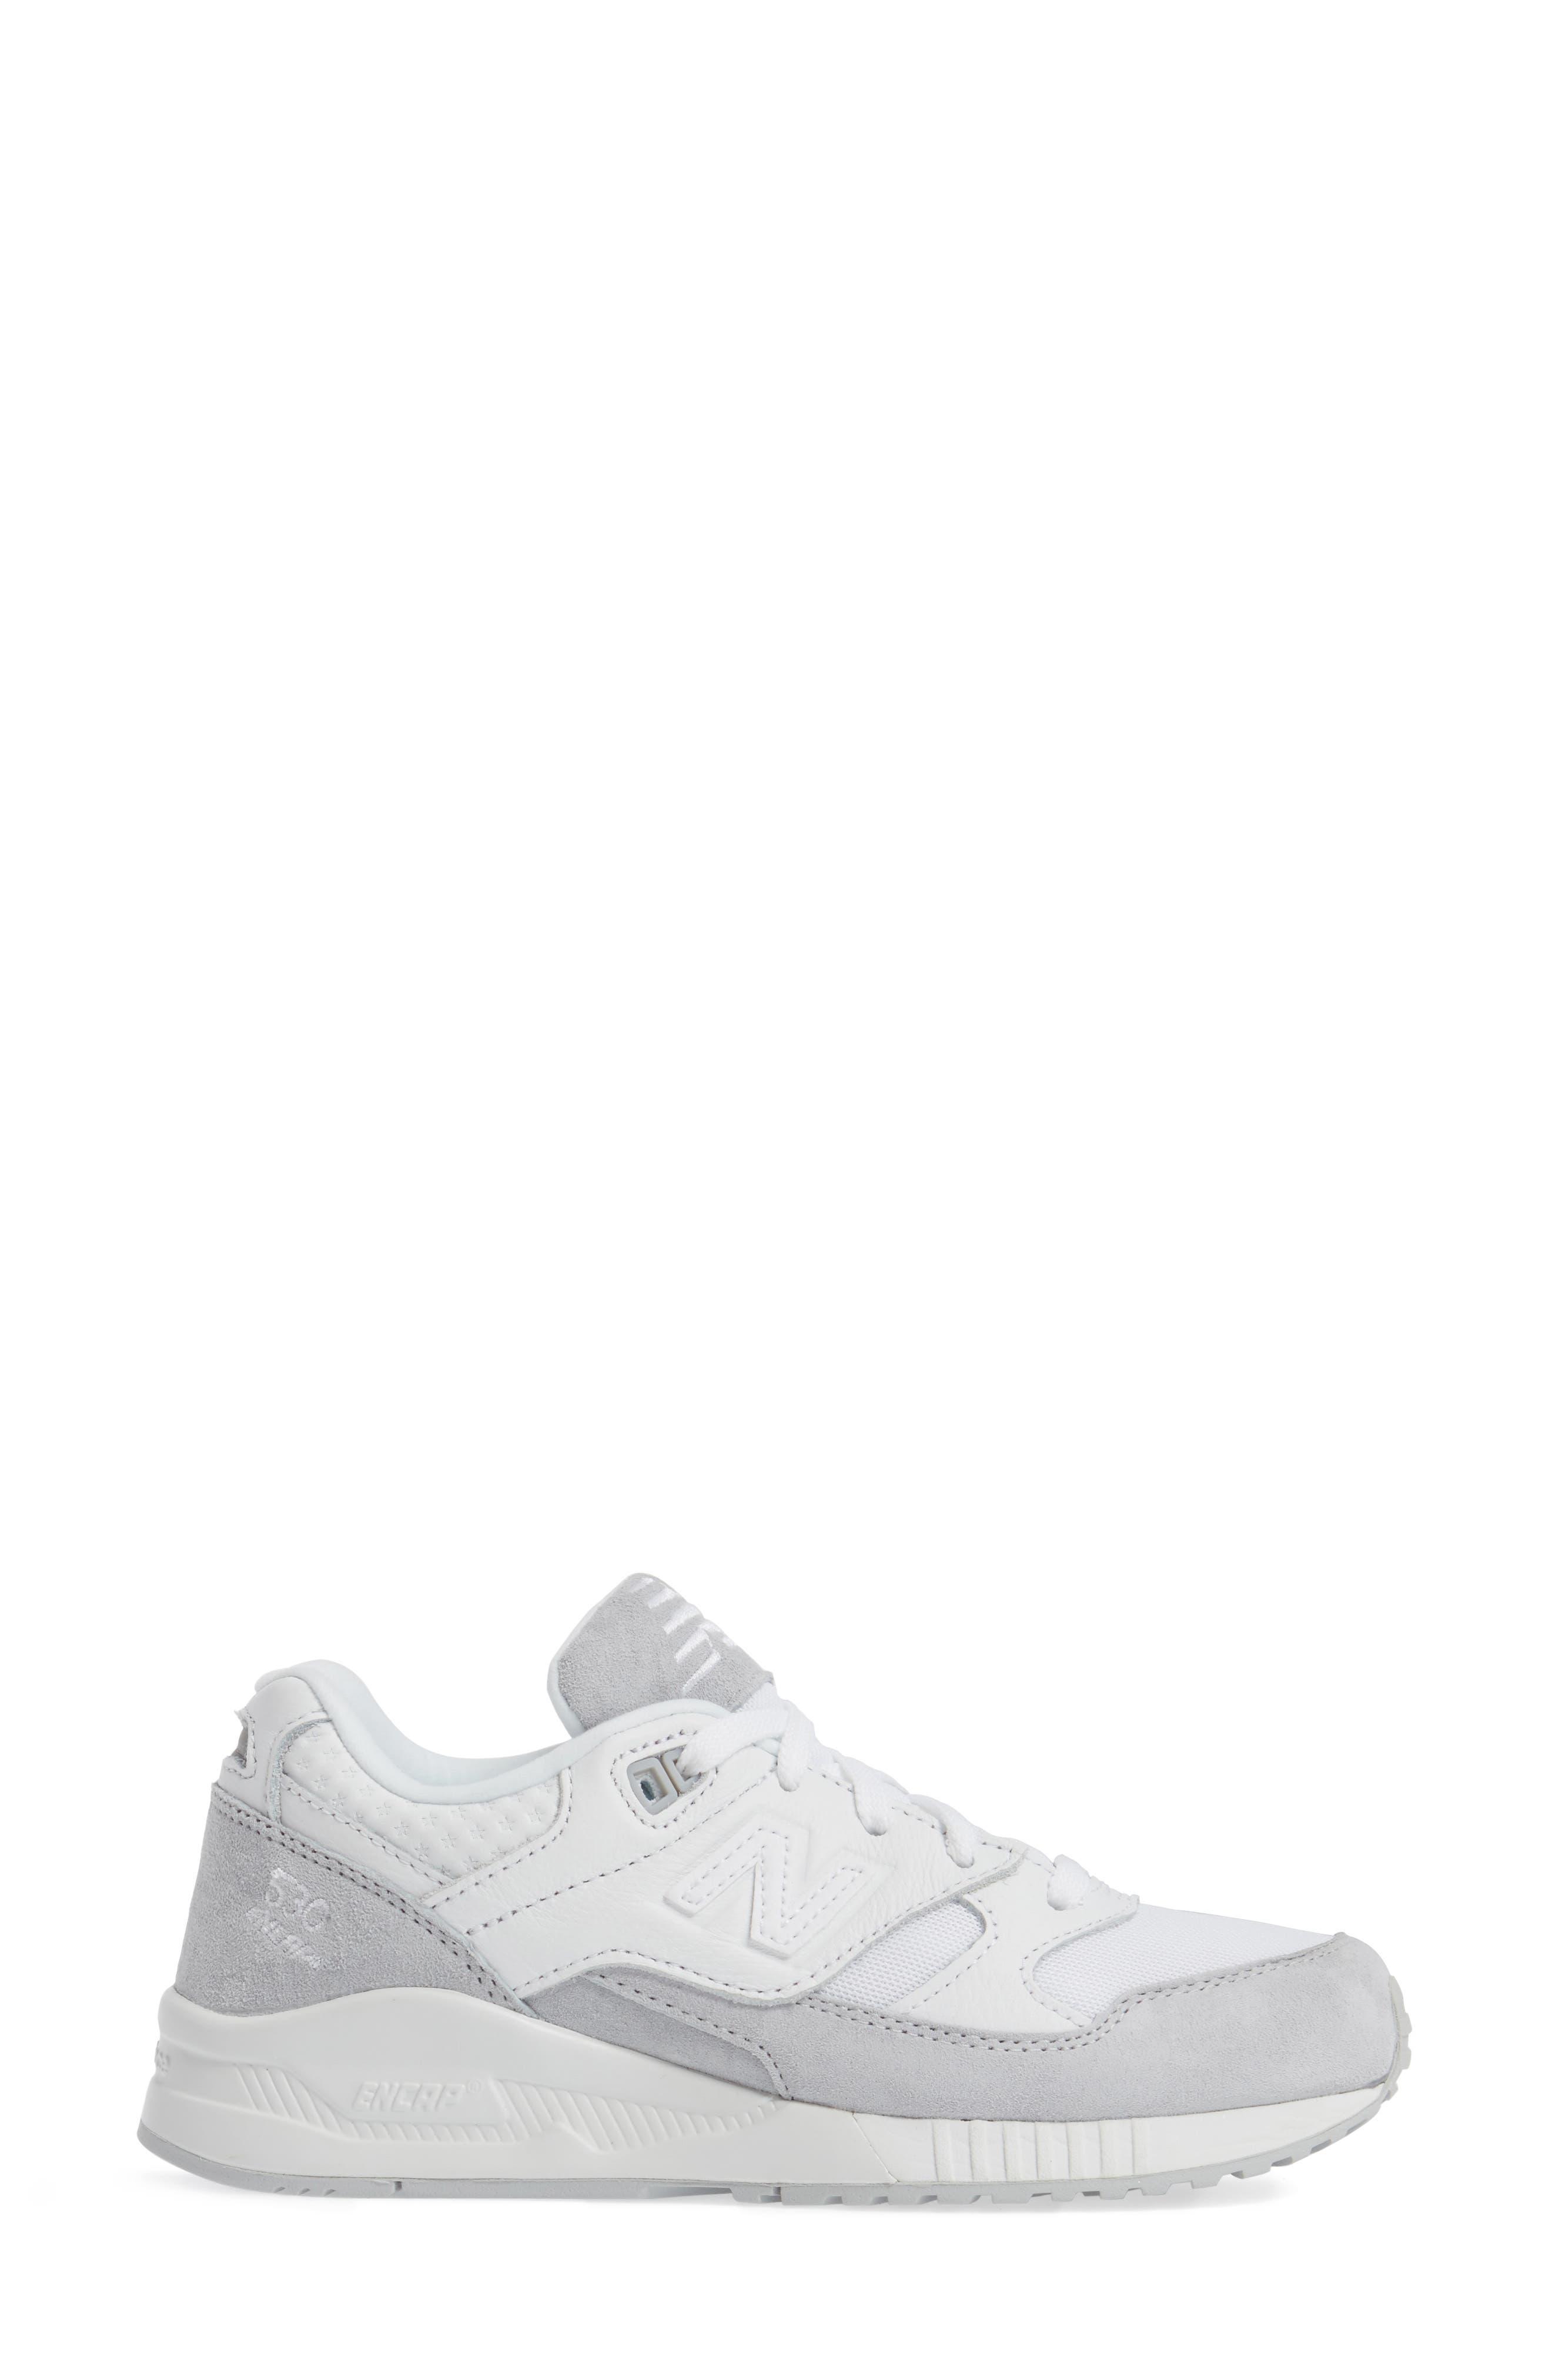 Alternate Image 3  - New Balance '530' Sneaker (Women)